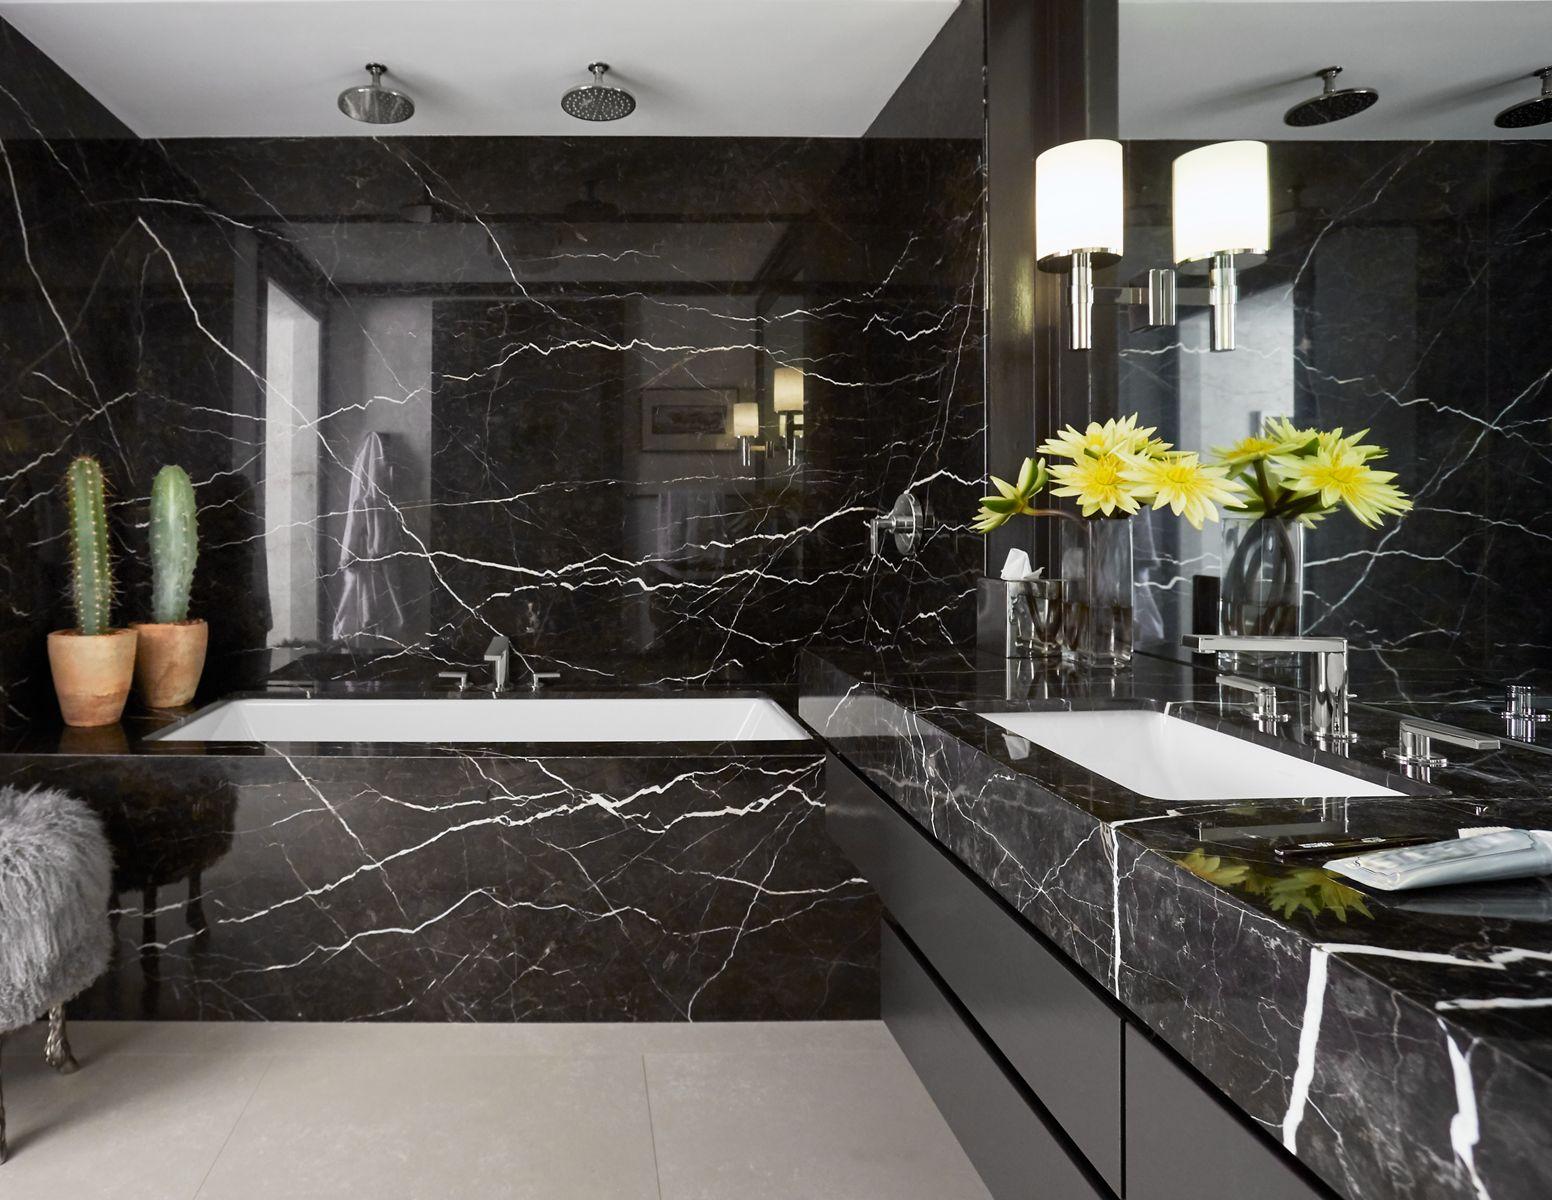 Kohler toilets showers sinks faucets and more for for Megan u bathroom tour